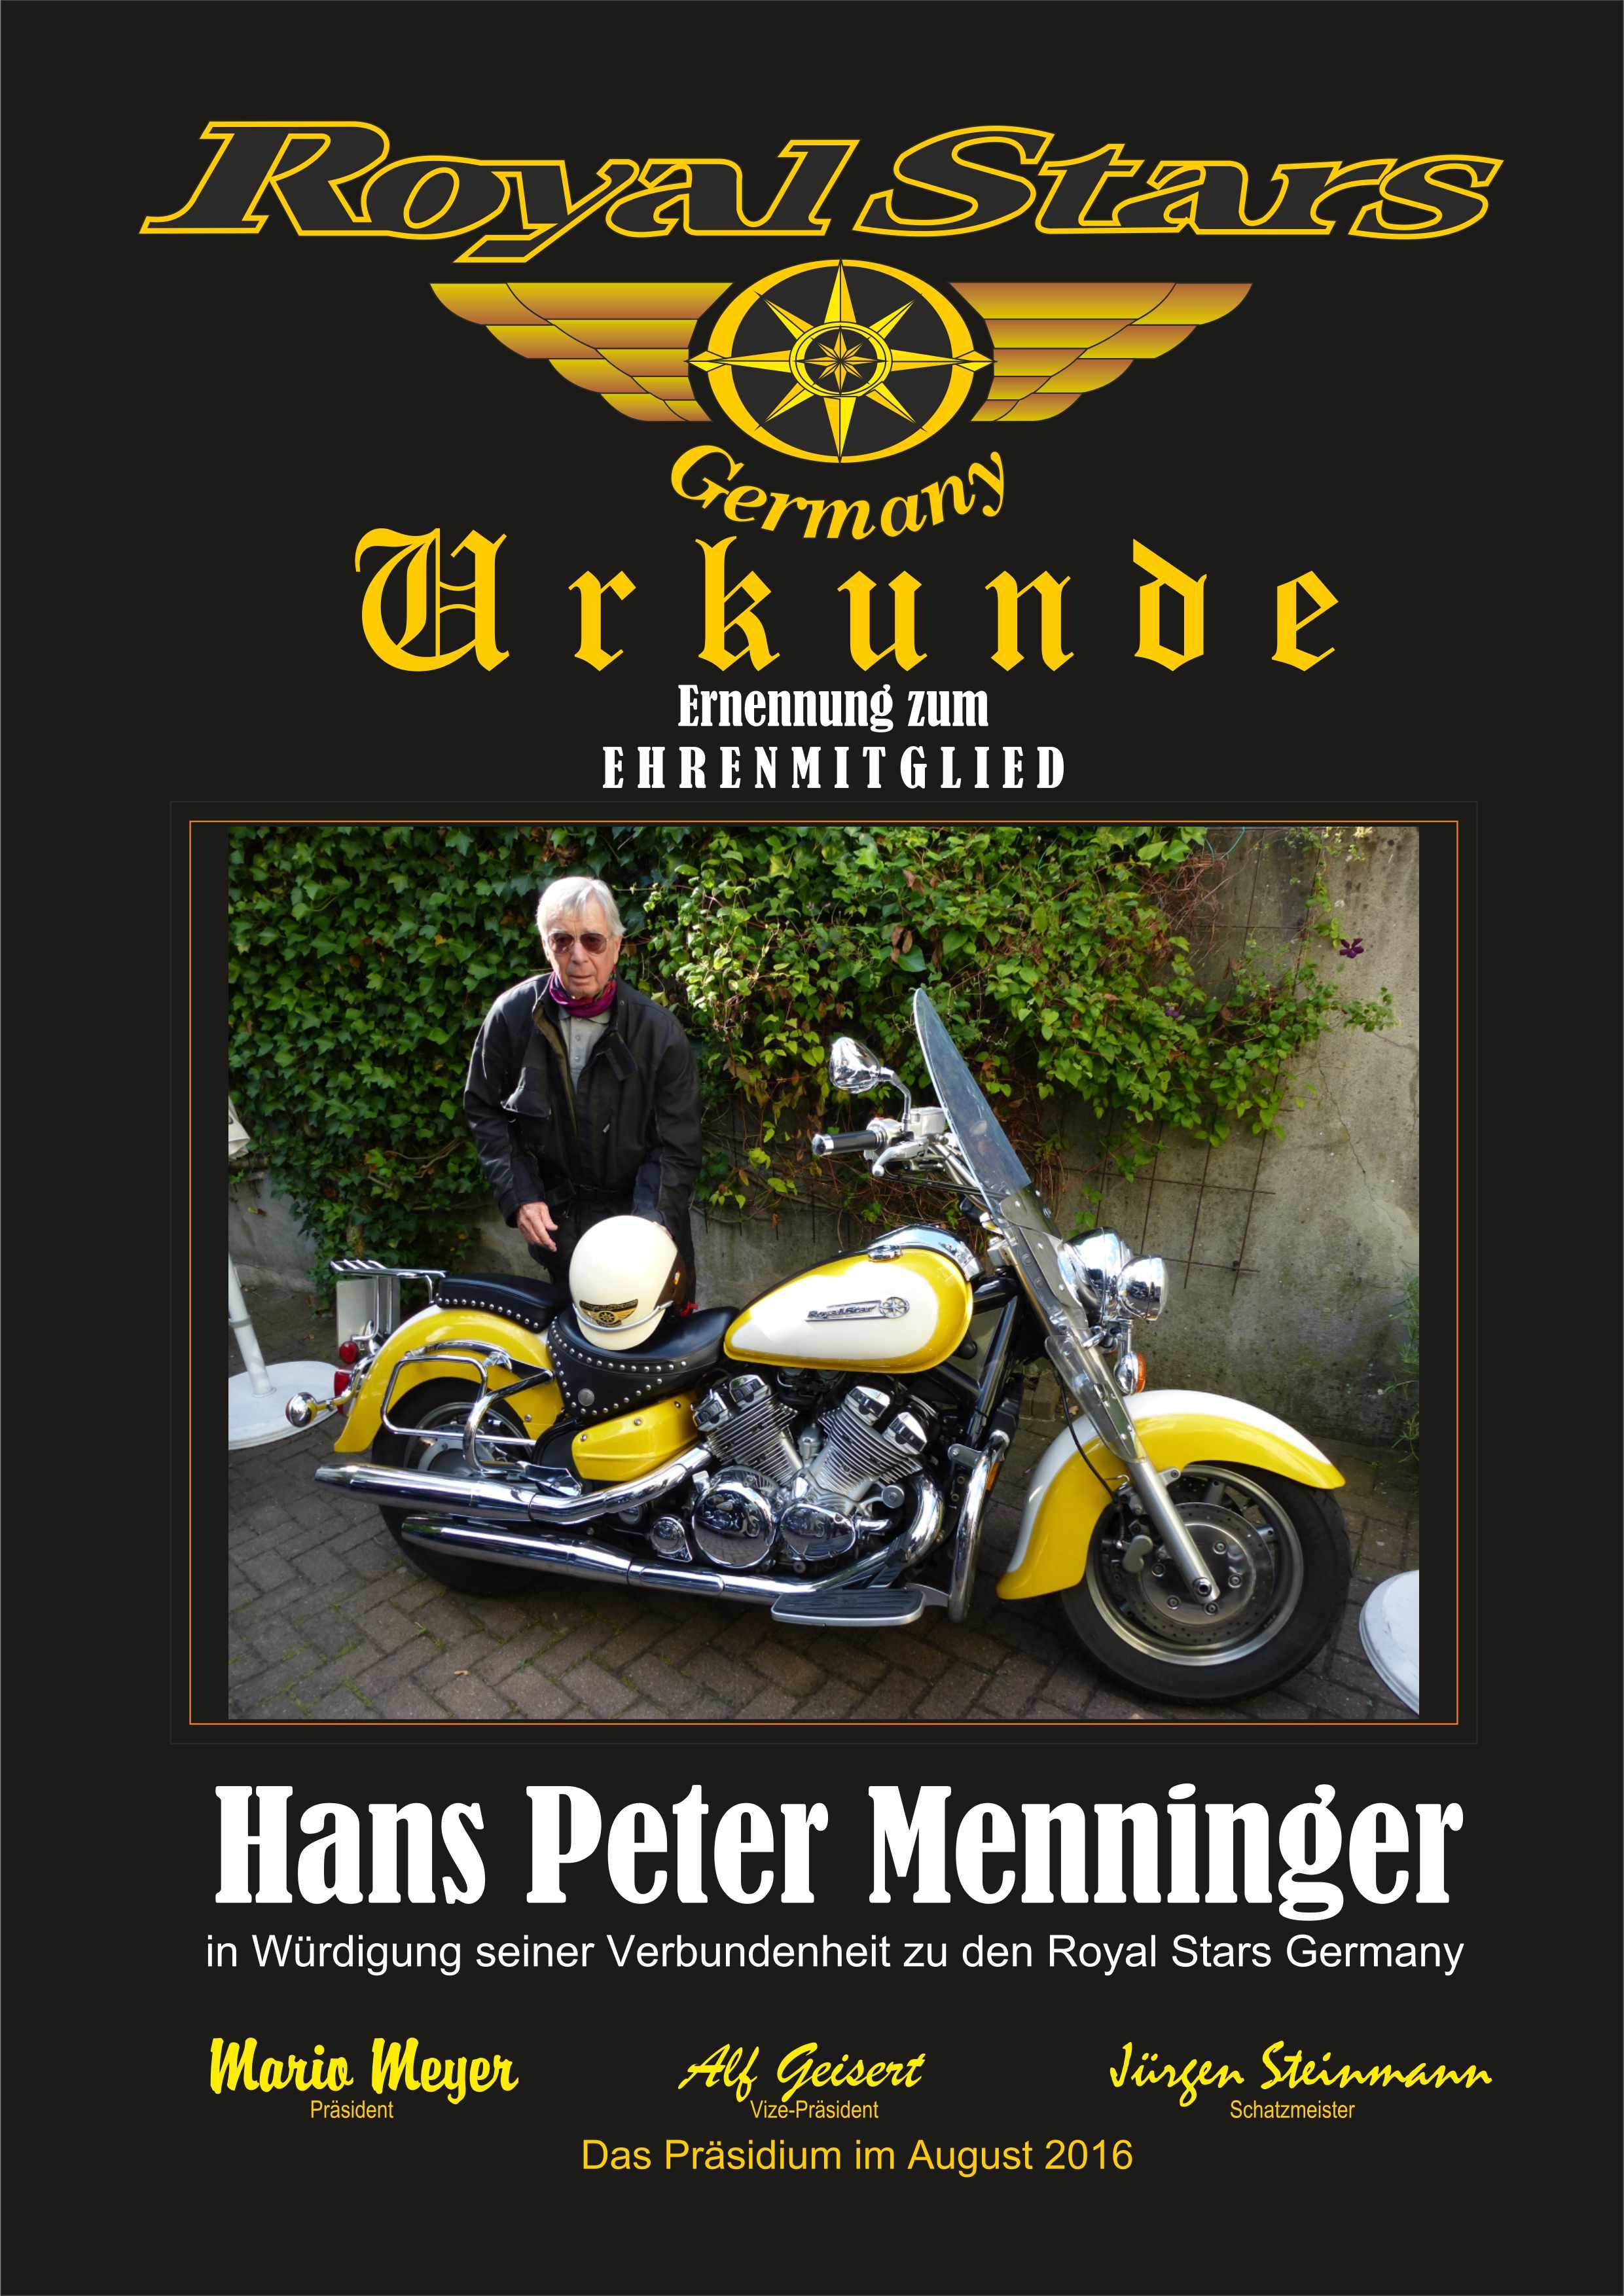 ehrenurkunde-2016-hans peter menninger